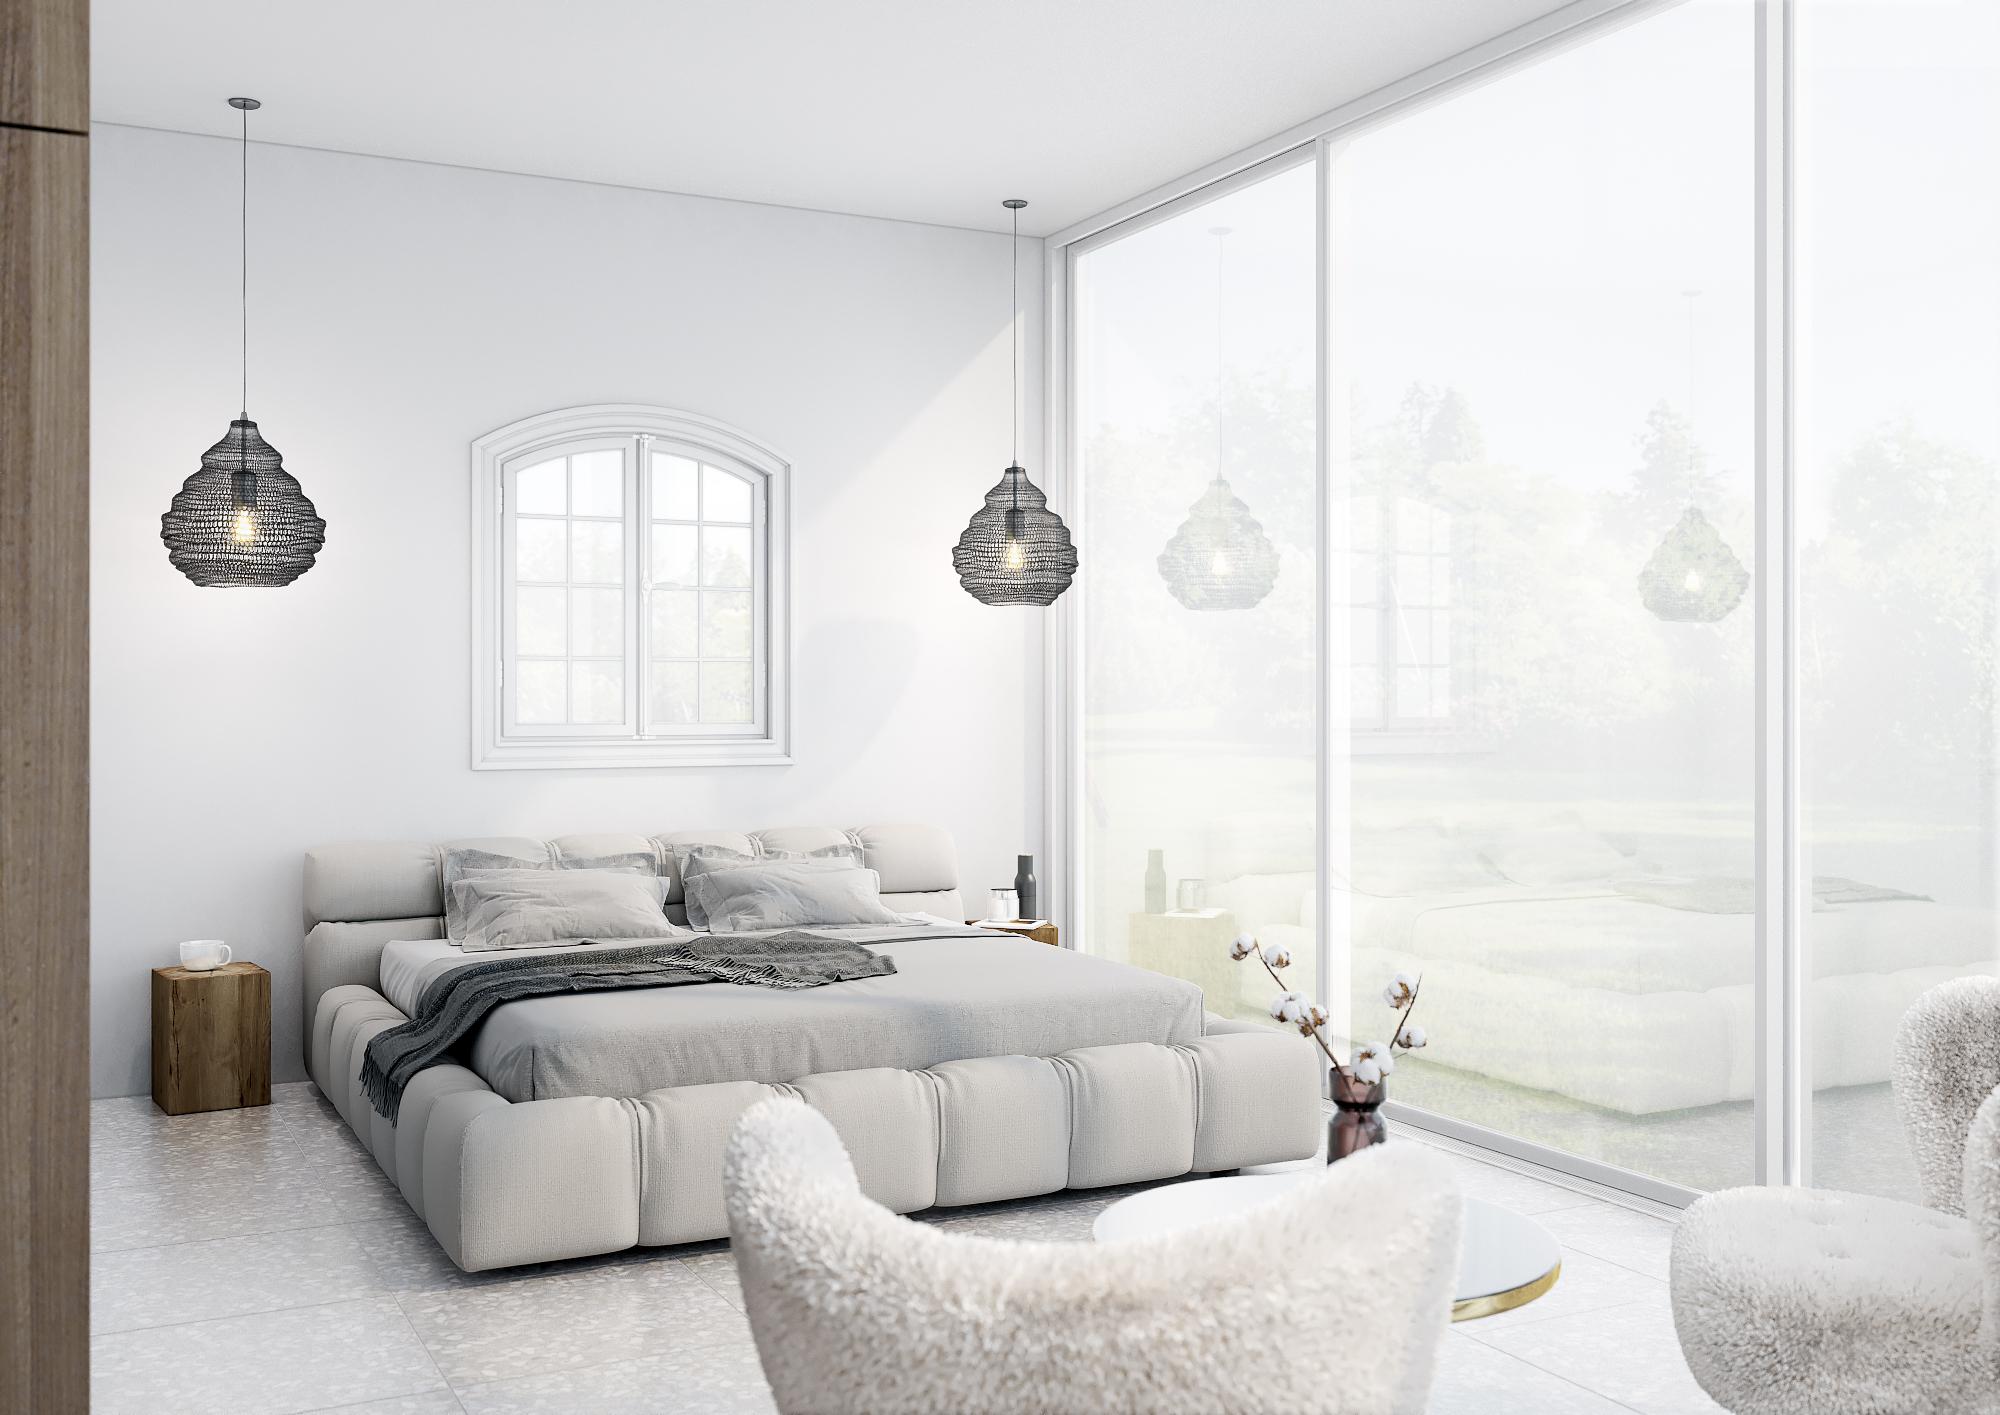 Bedroom_View02_28.07.2019.jpg